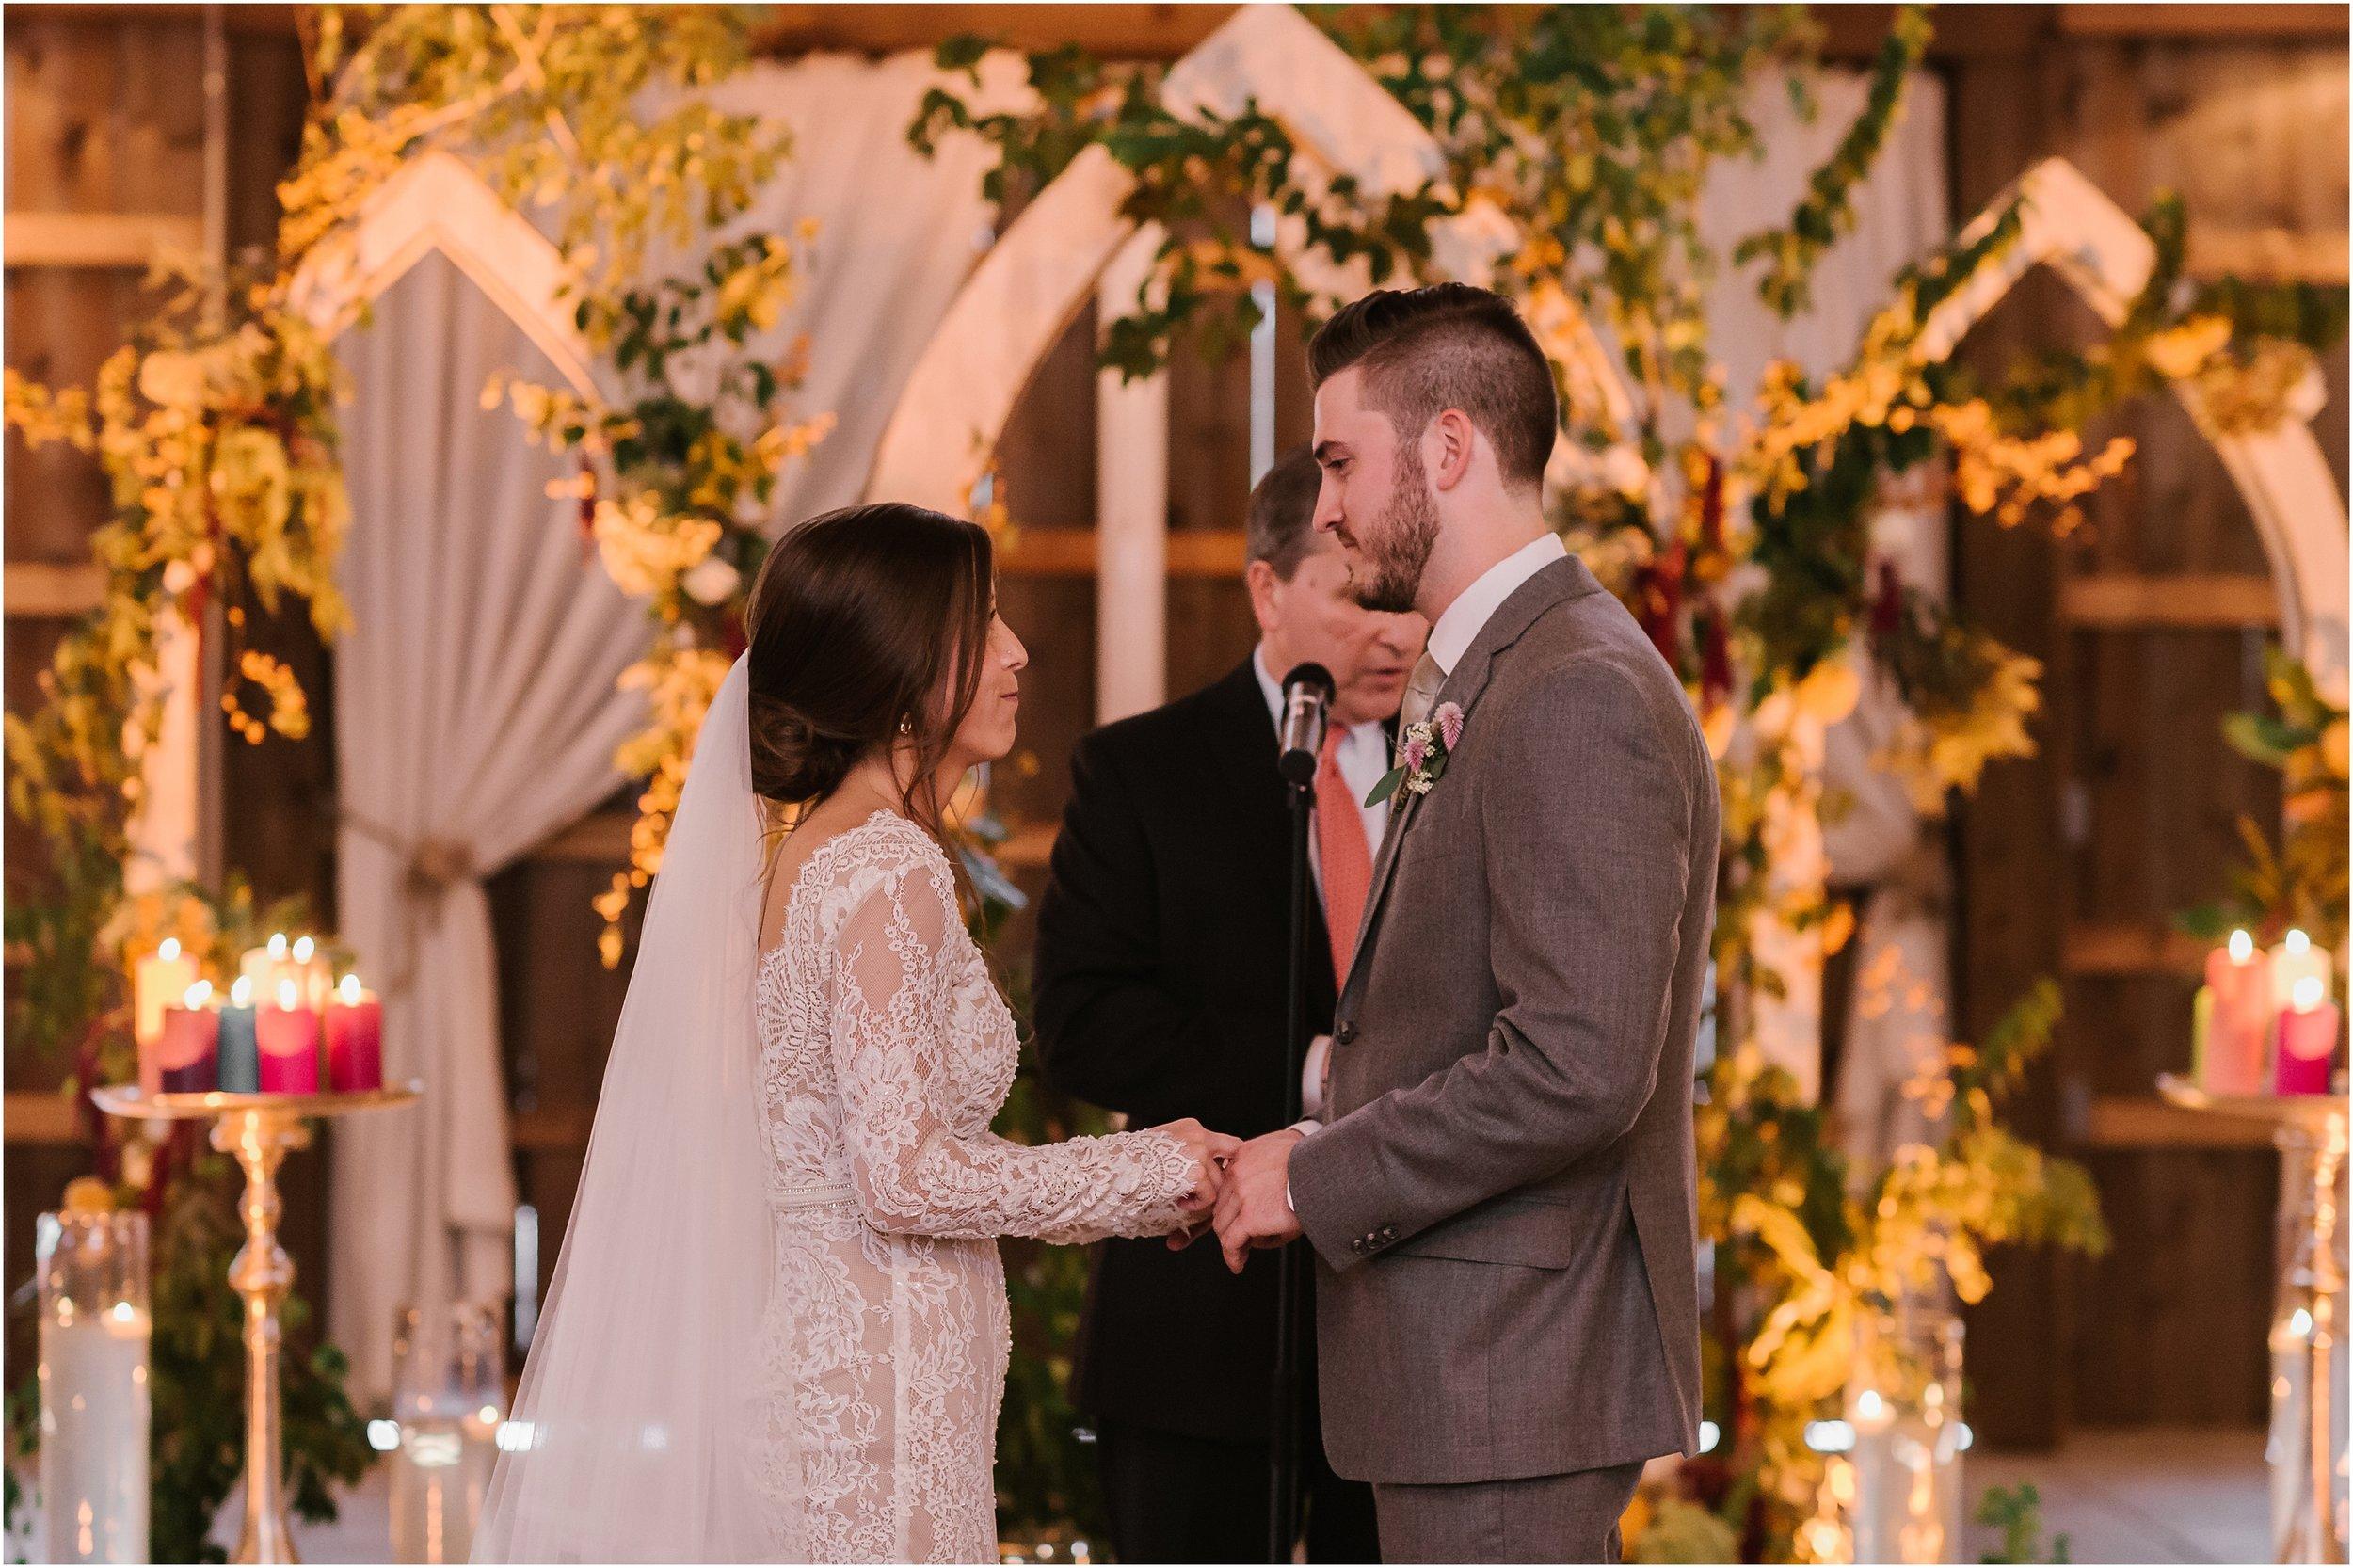 Rebecca_Shehorn_Photography_Indianapolis_Wedding_Photographer_9270.jpg